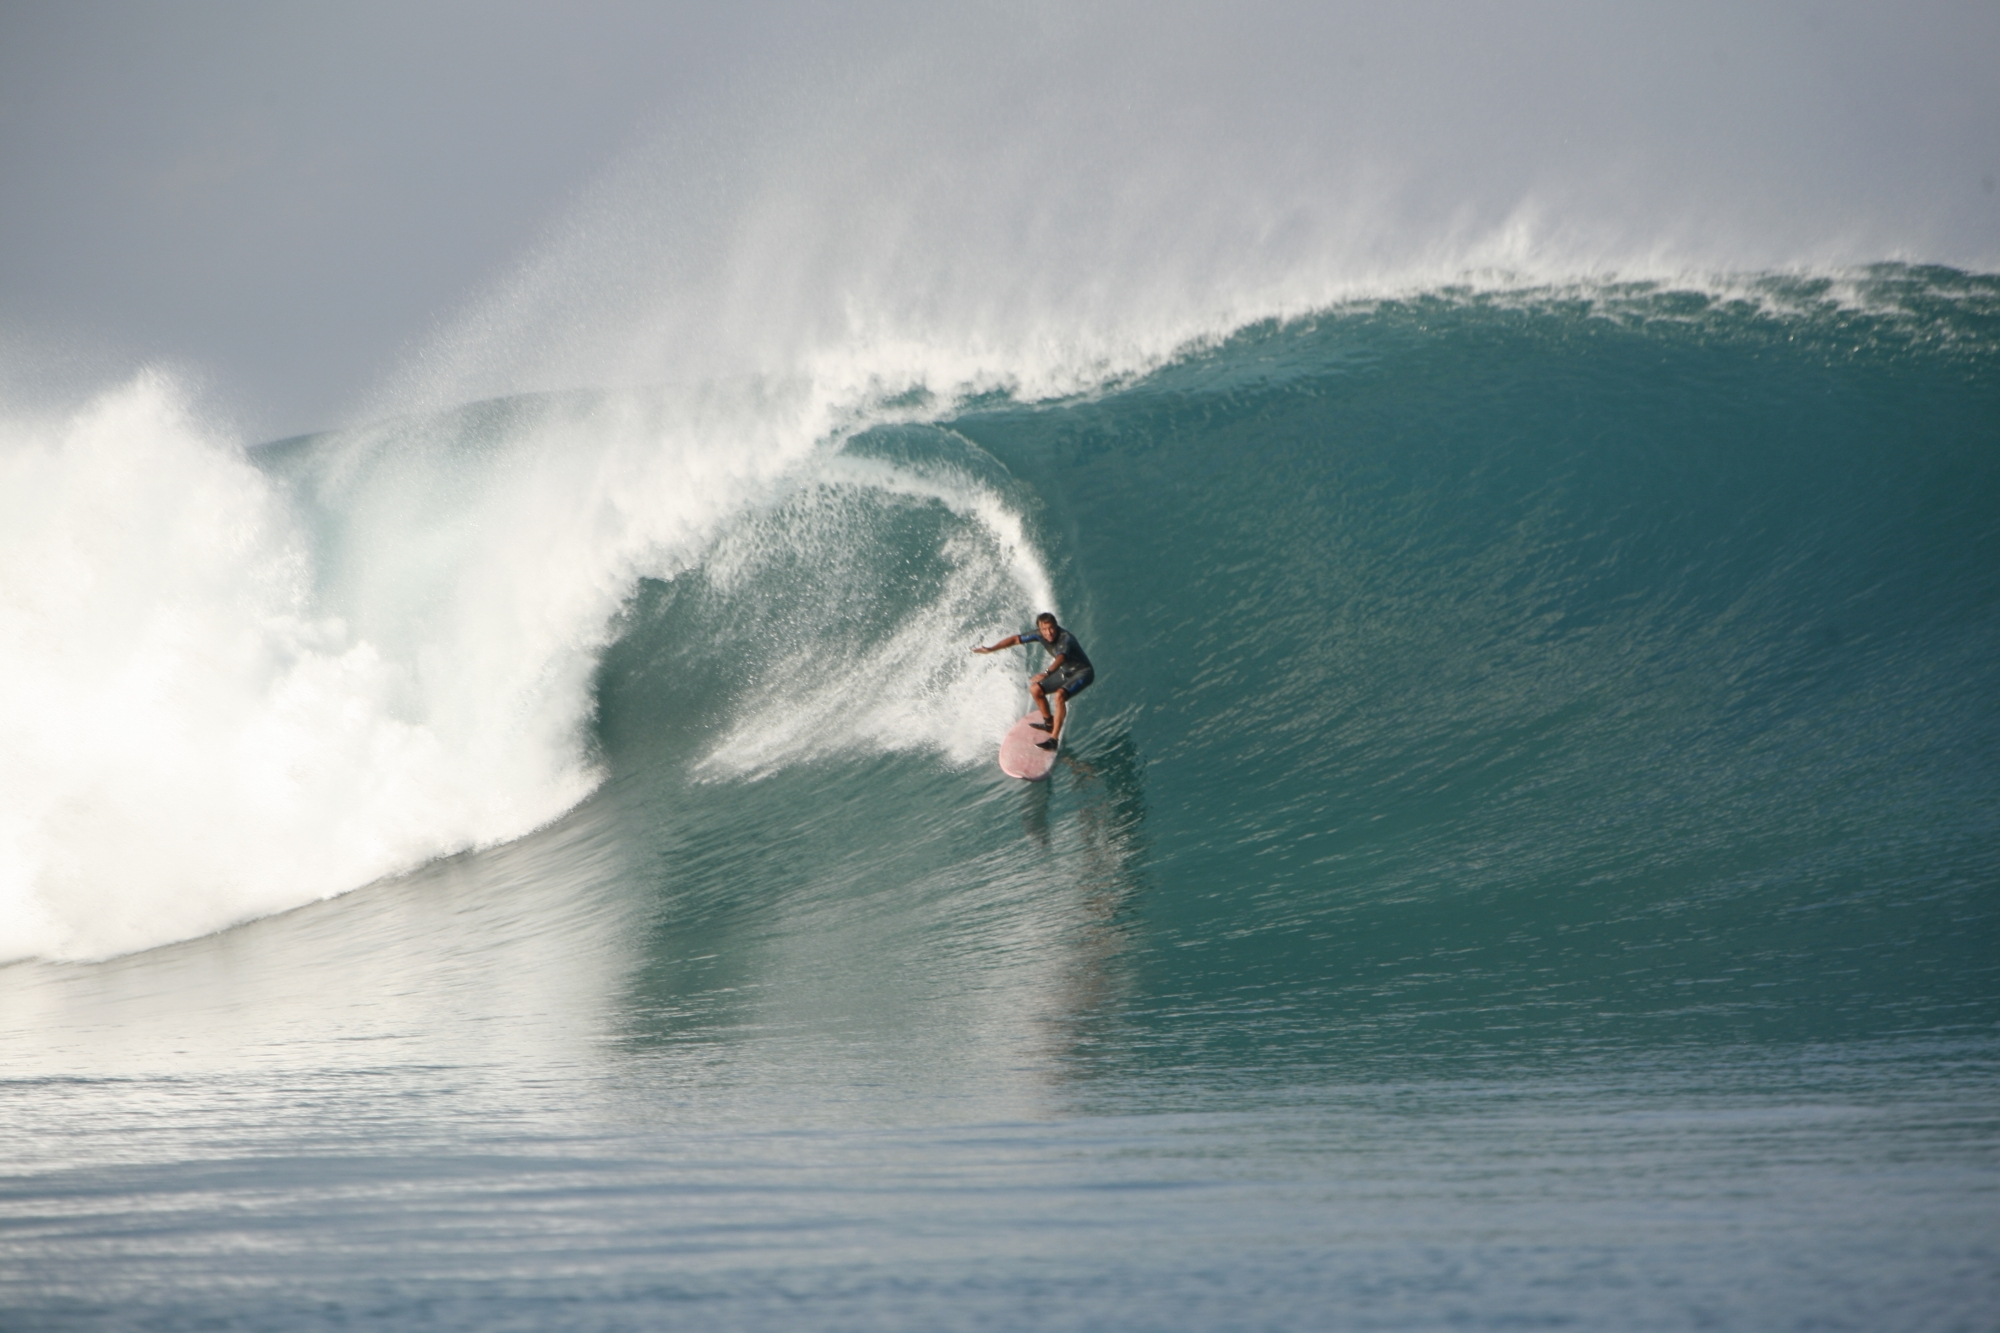 72 Year-Old Peruvian Surf Legend Felipe Pomar is Still Kicking Ass on the Water